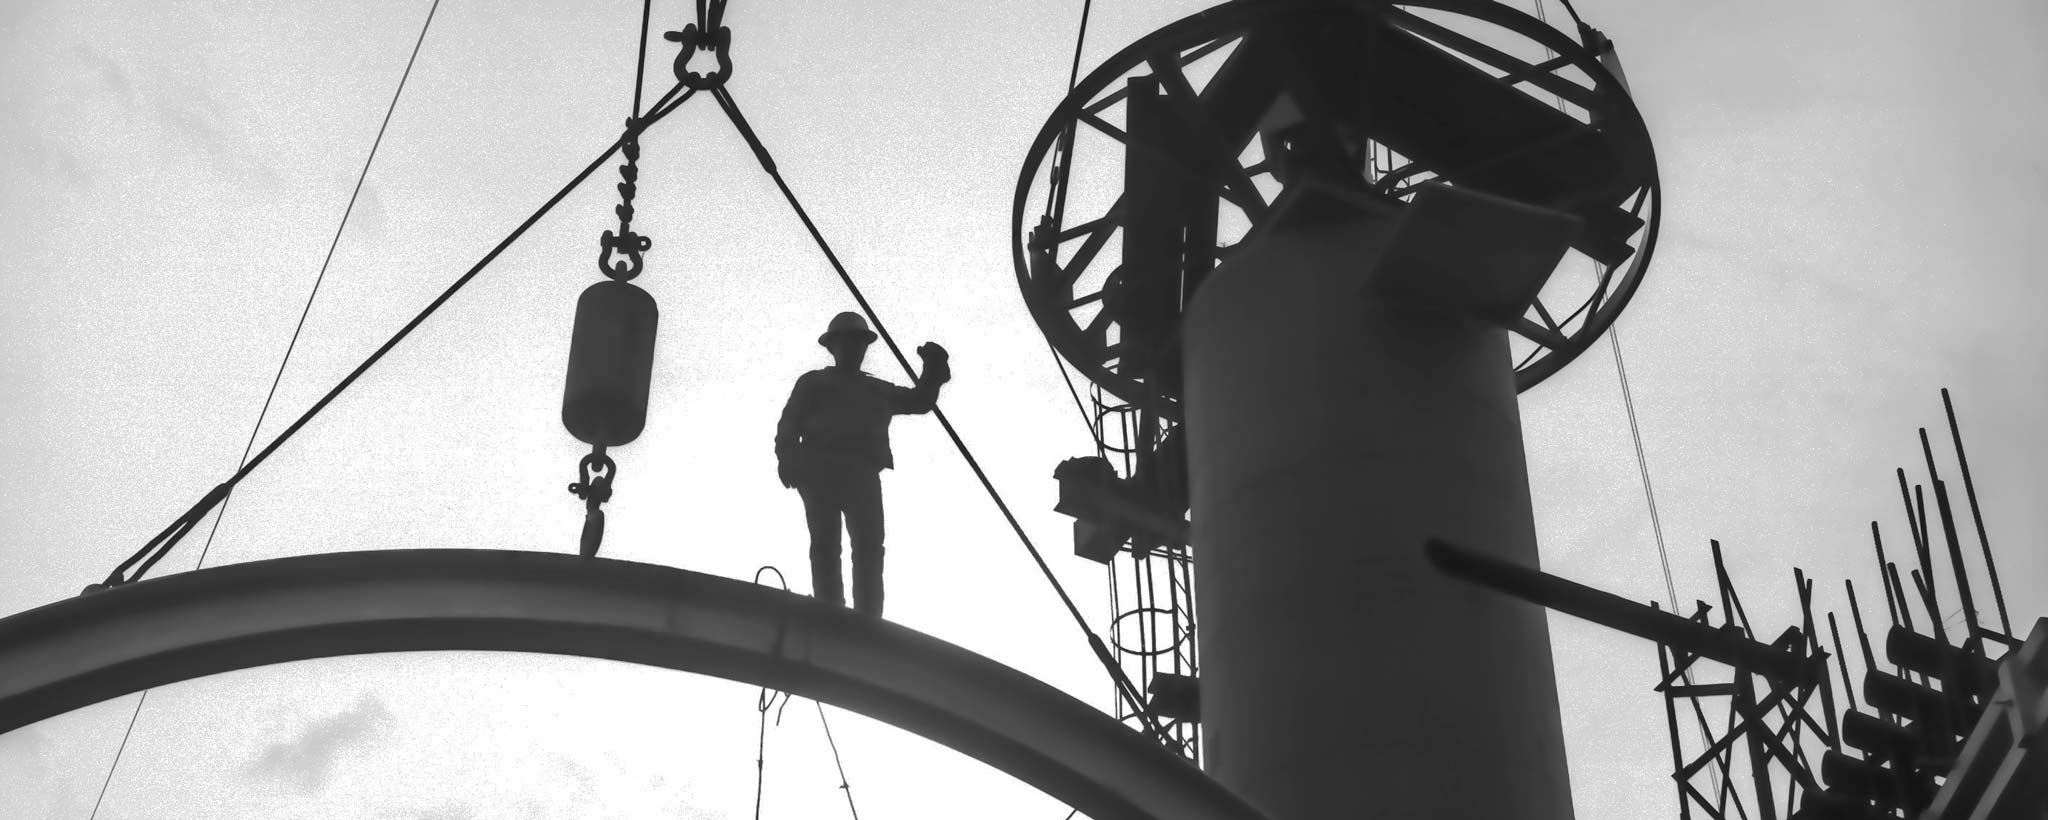 Plant construction worker